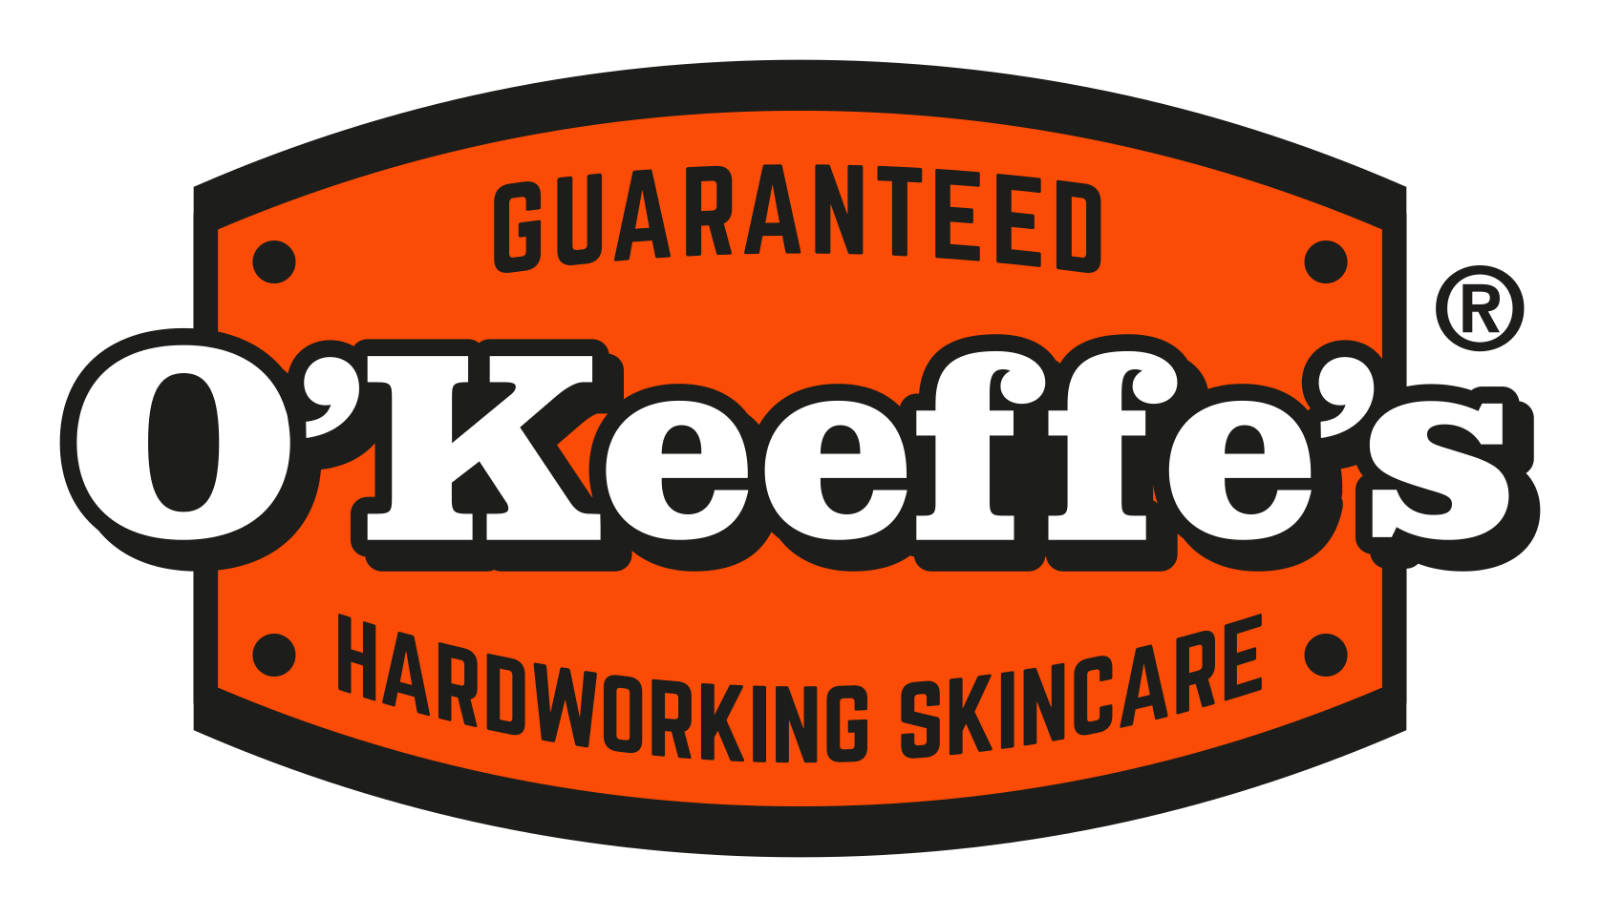 O'Keeffe's Working Hands Handcreme / extrem trockene, rissige, spröde Hände 85g